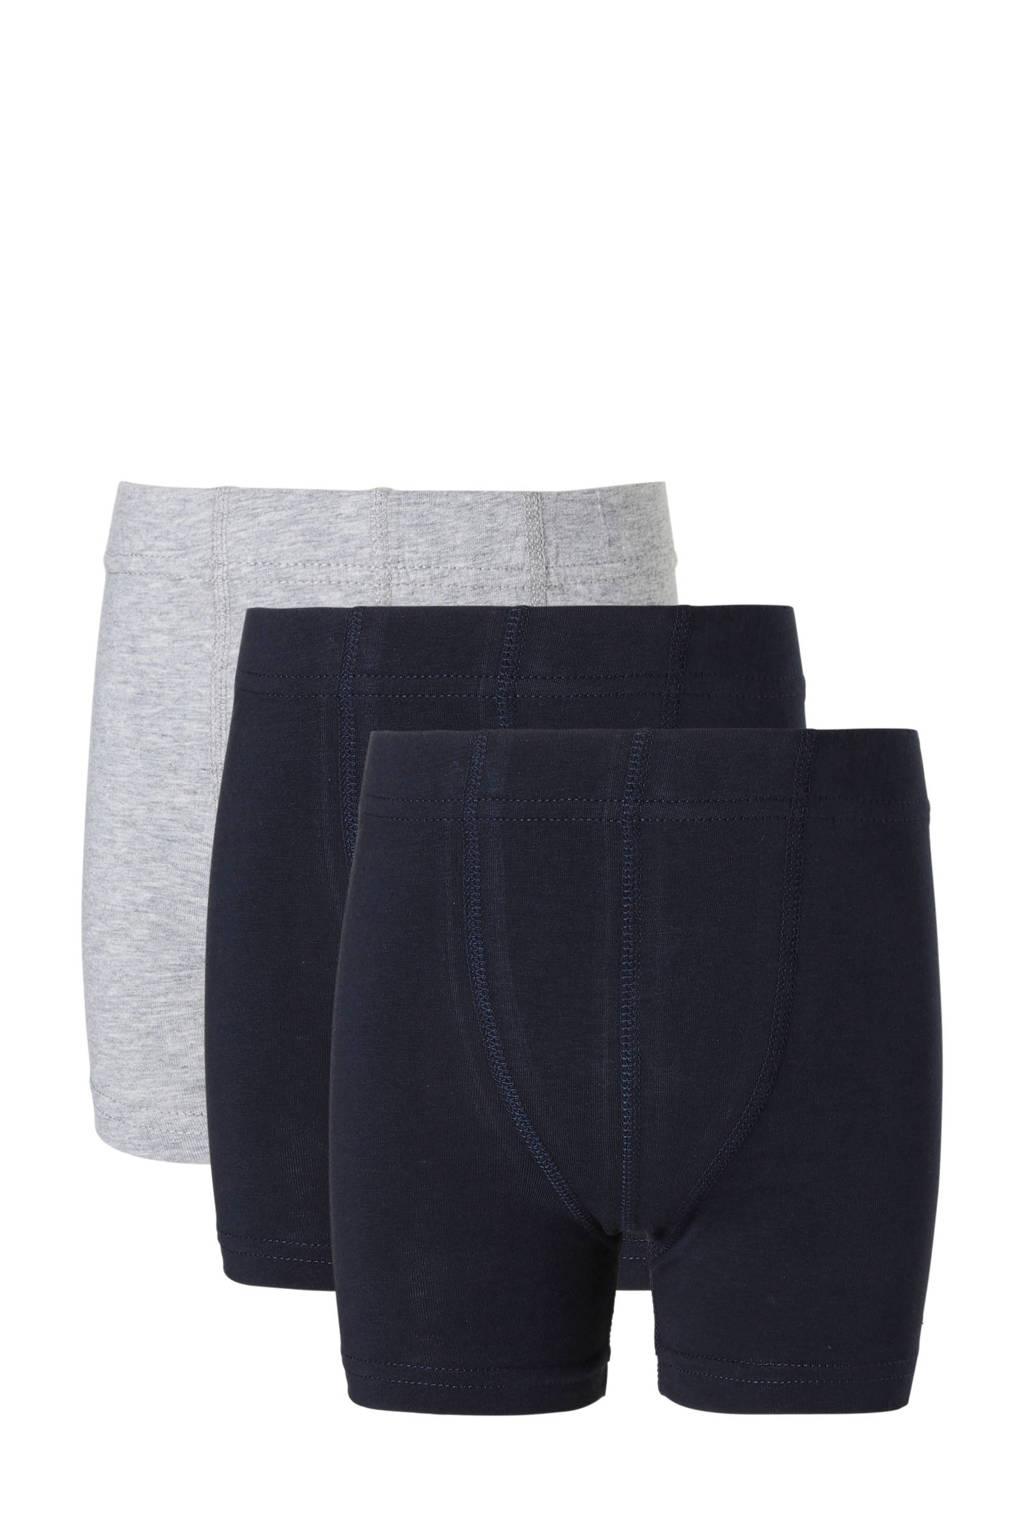 NAME IT MINI   boxershort - set van 3 donkerblauw/grijs melange, Donkerblauw/grijs melange